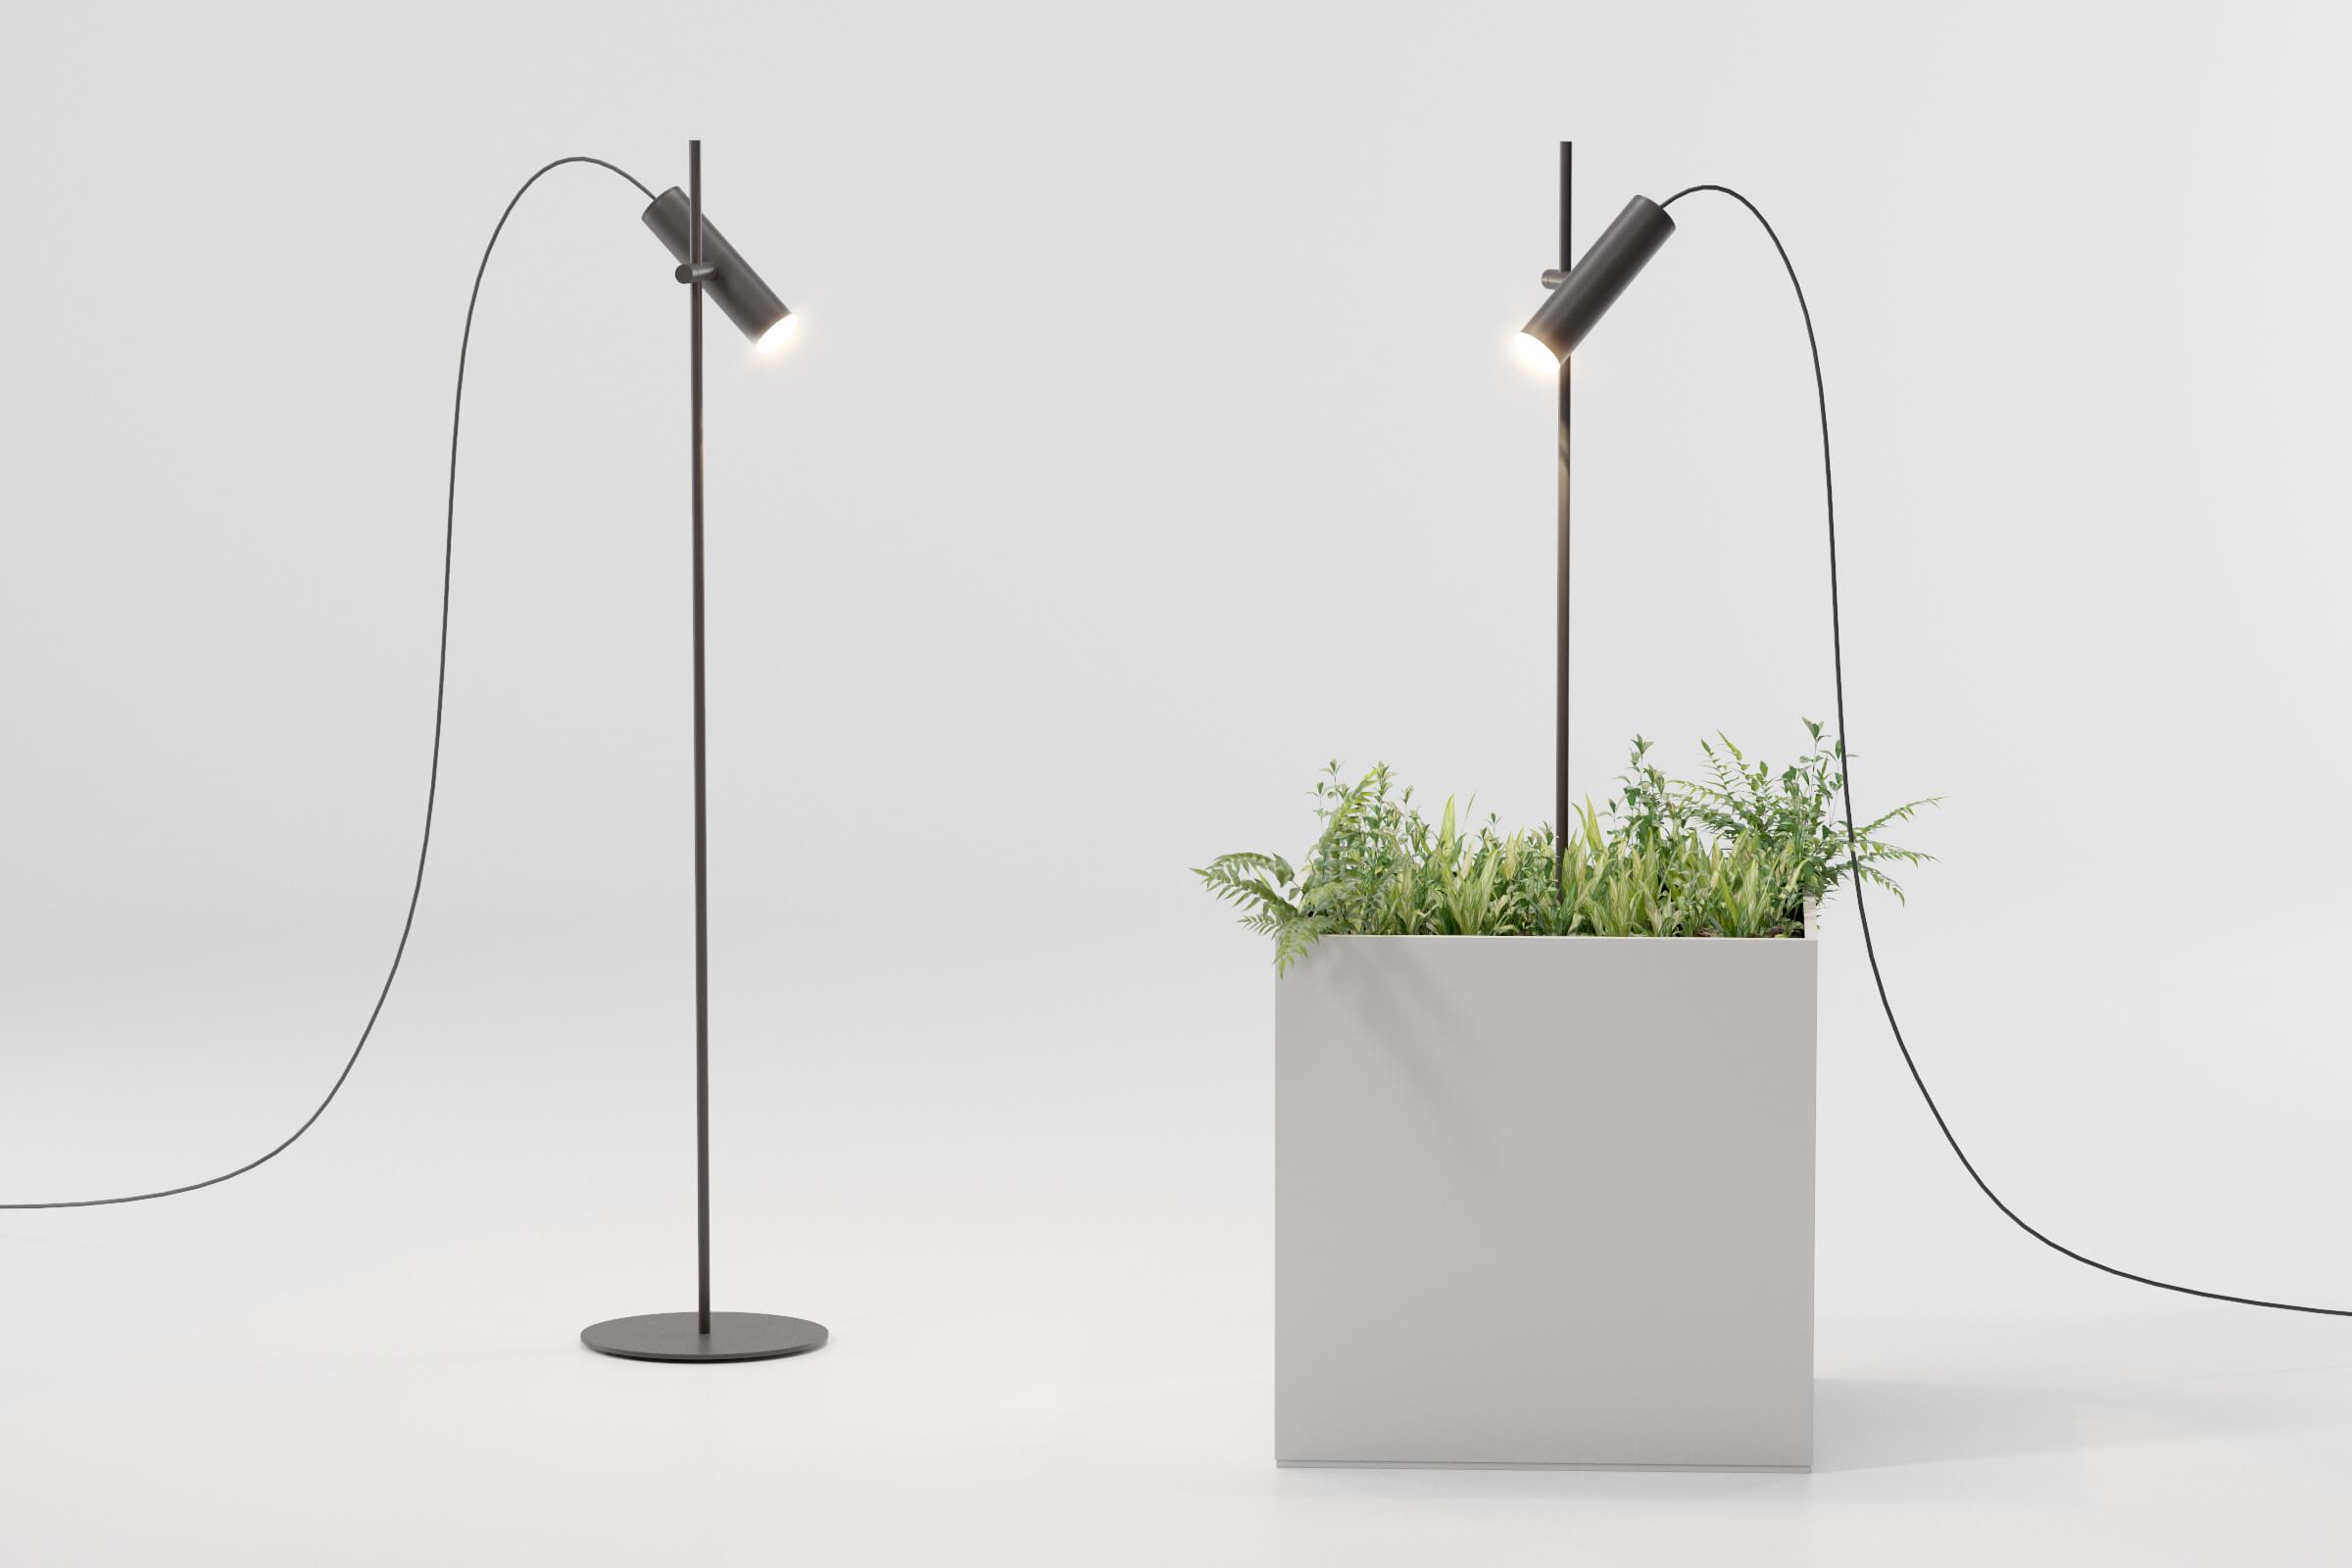 1599_0_Dots_bollard_planter_lamp.jpg